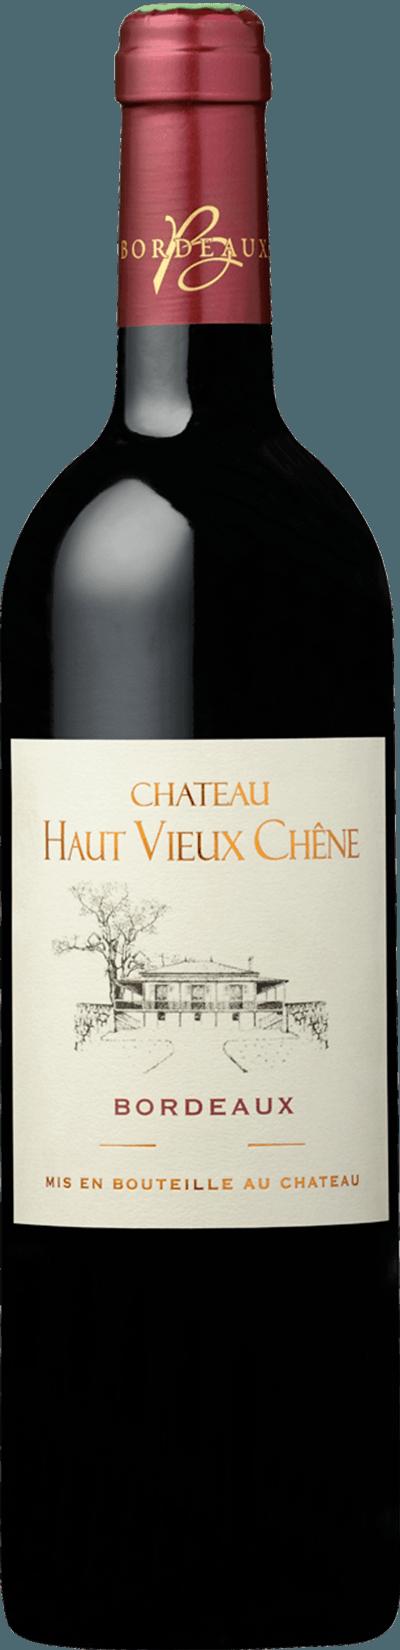 Château Haut Vieux Chêne